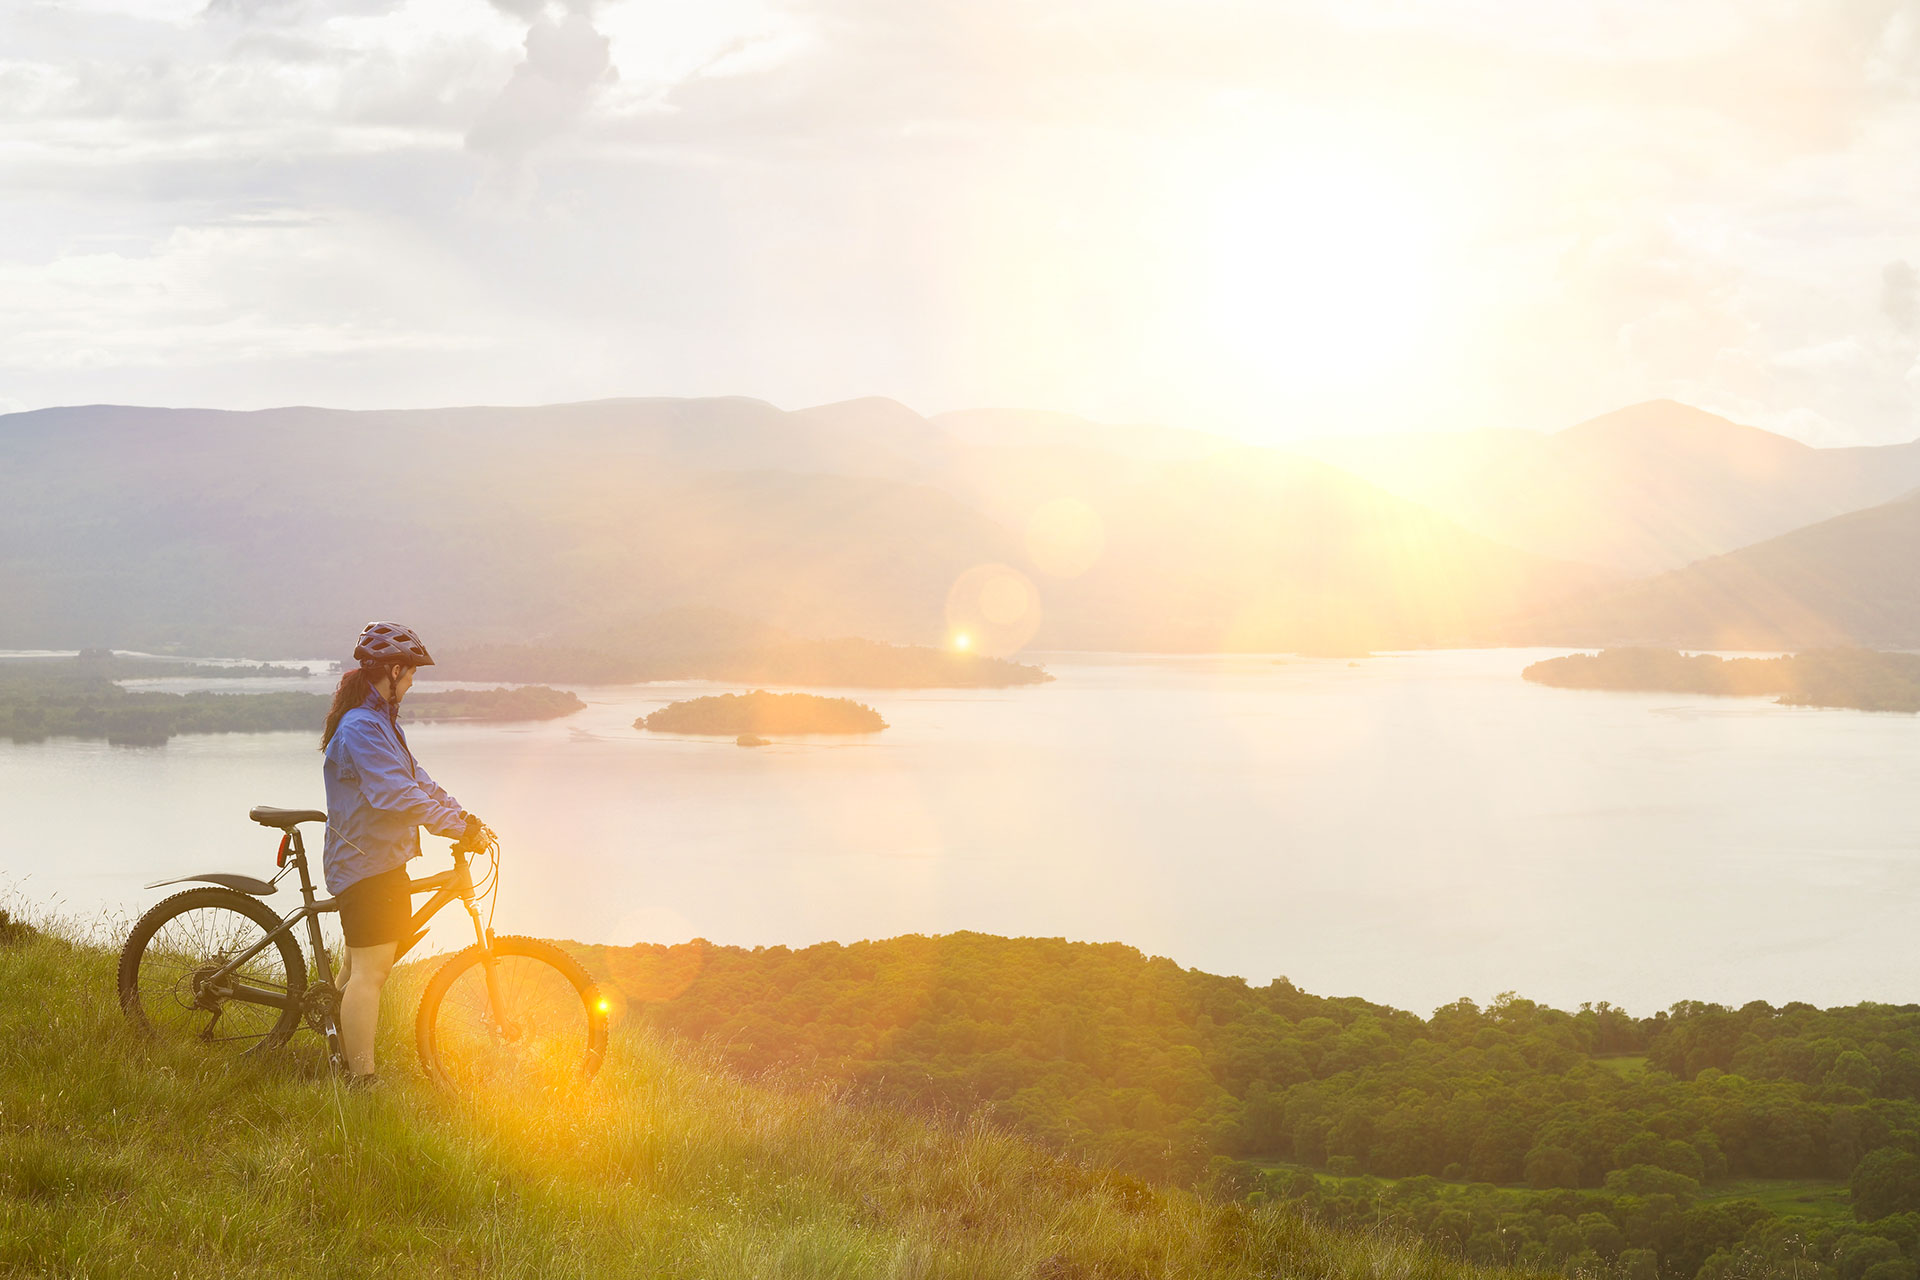 itinerari bici umbria: todi lago di corbara